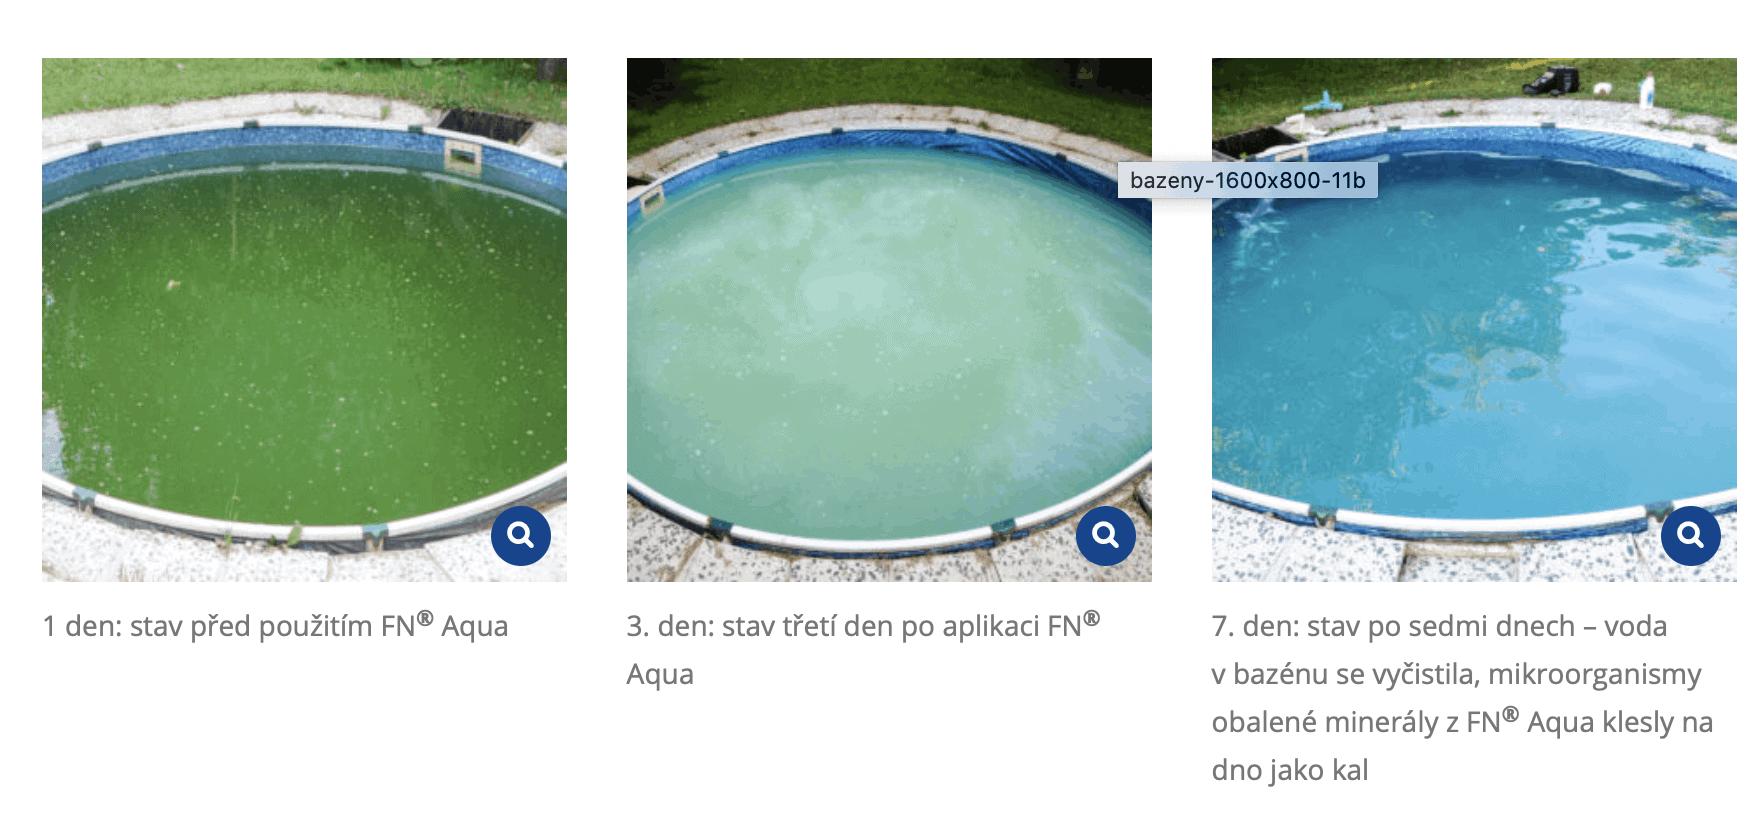 osetreni-bazenu-fn-aqua-zkusenosti